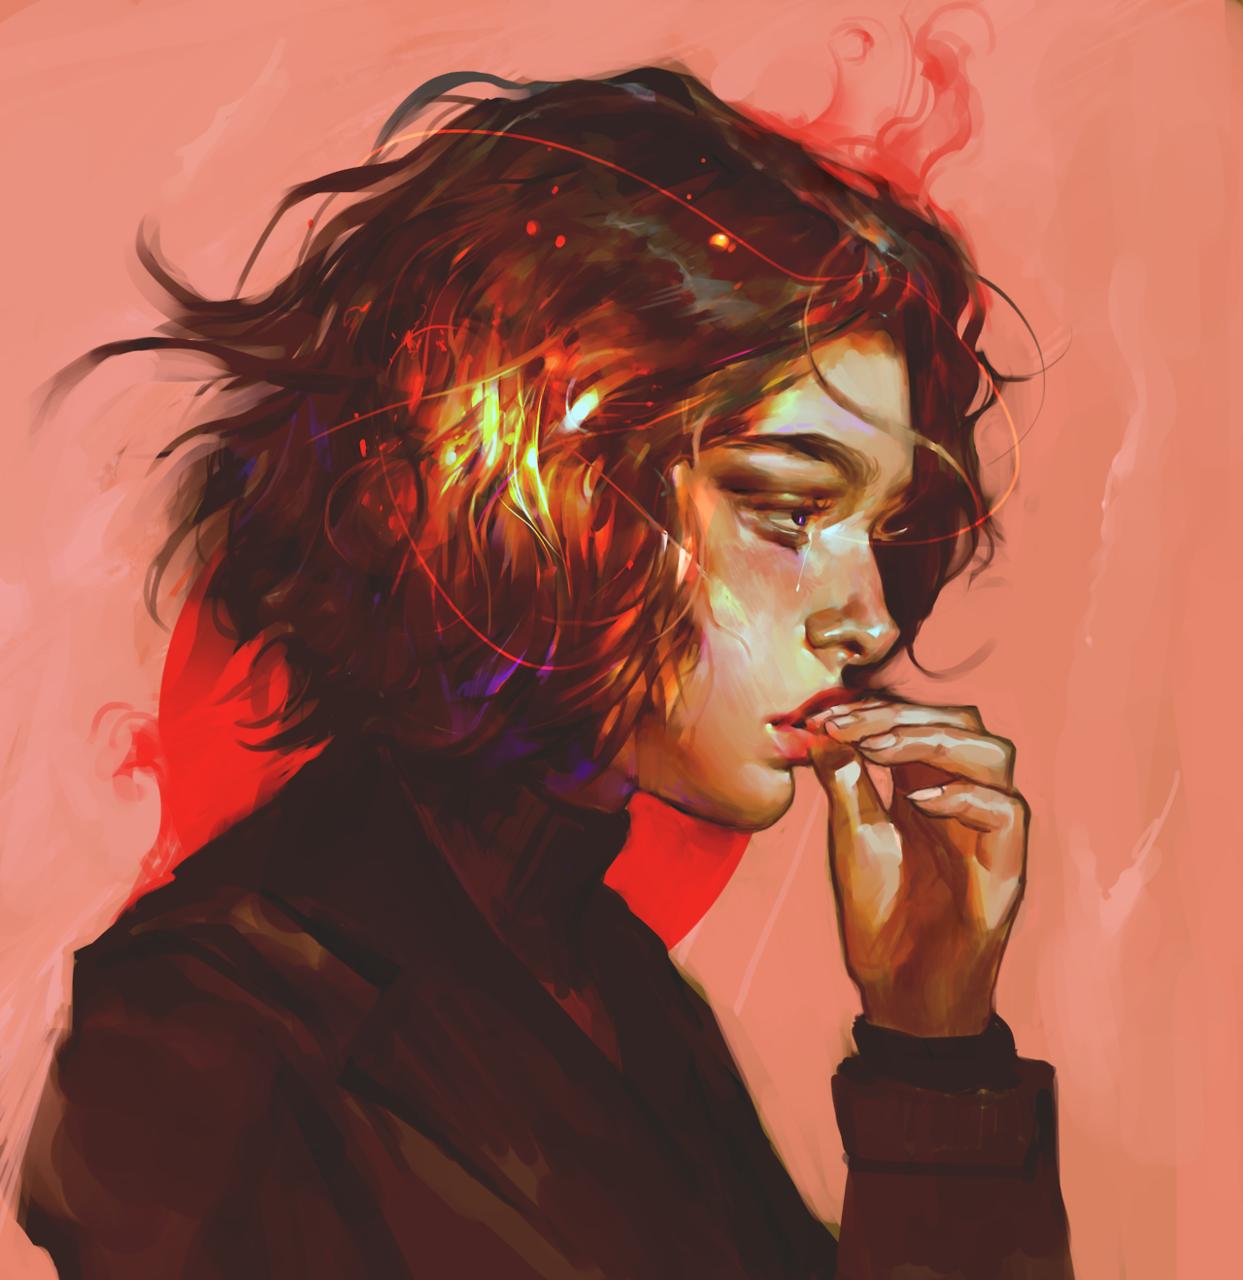 Anime girl red hair tumblr